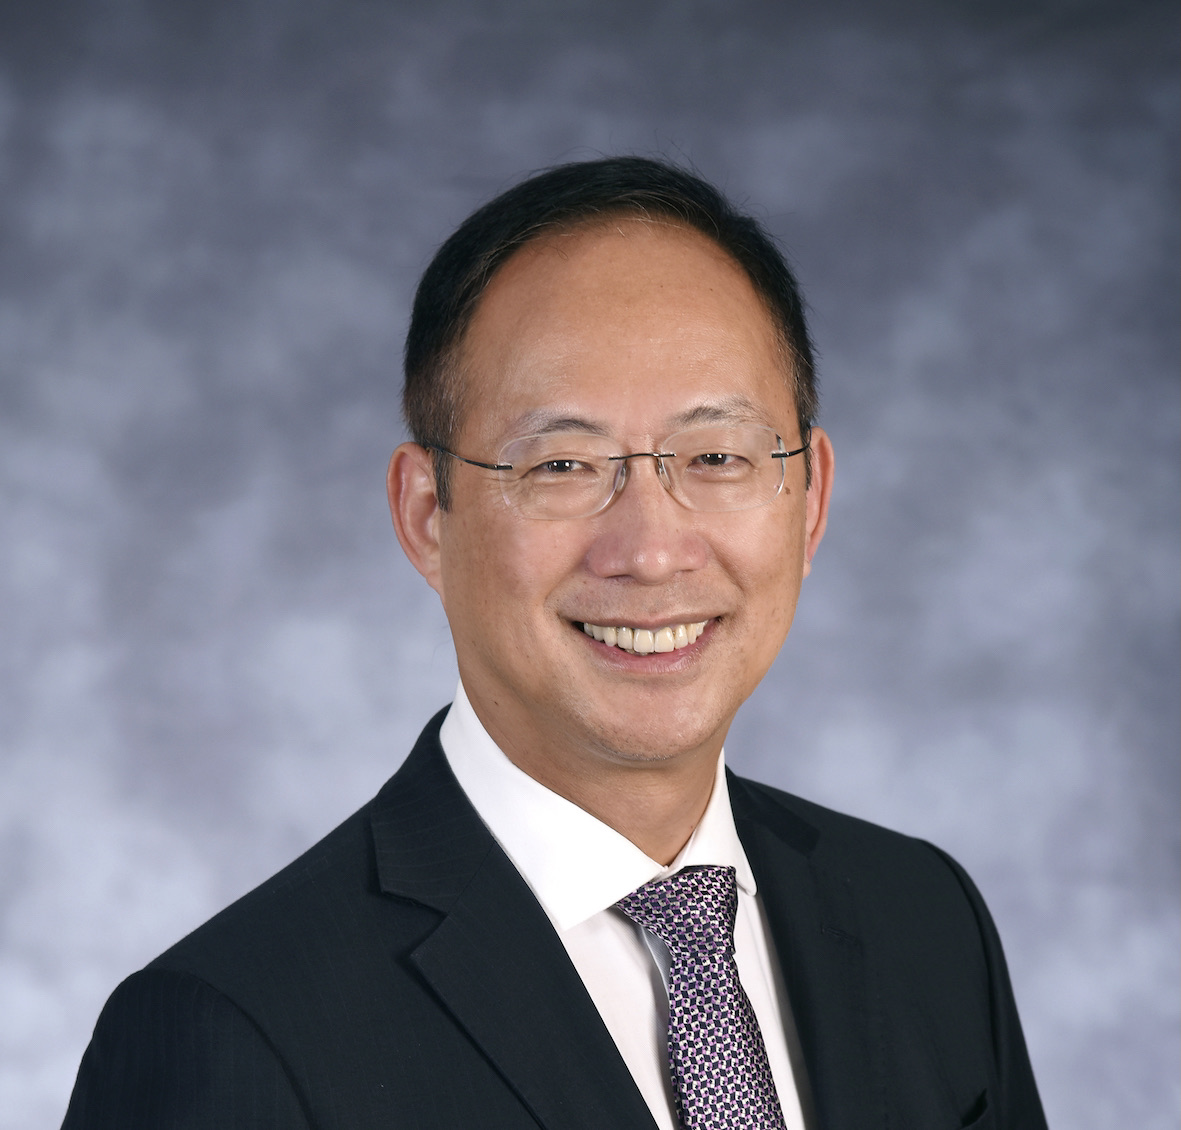 Professor Alexander Wai